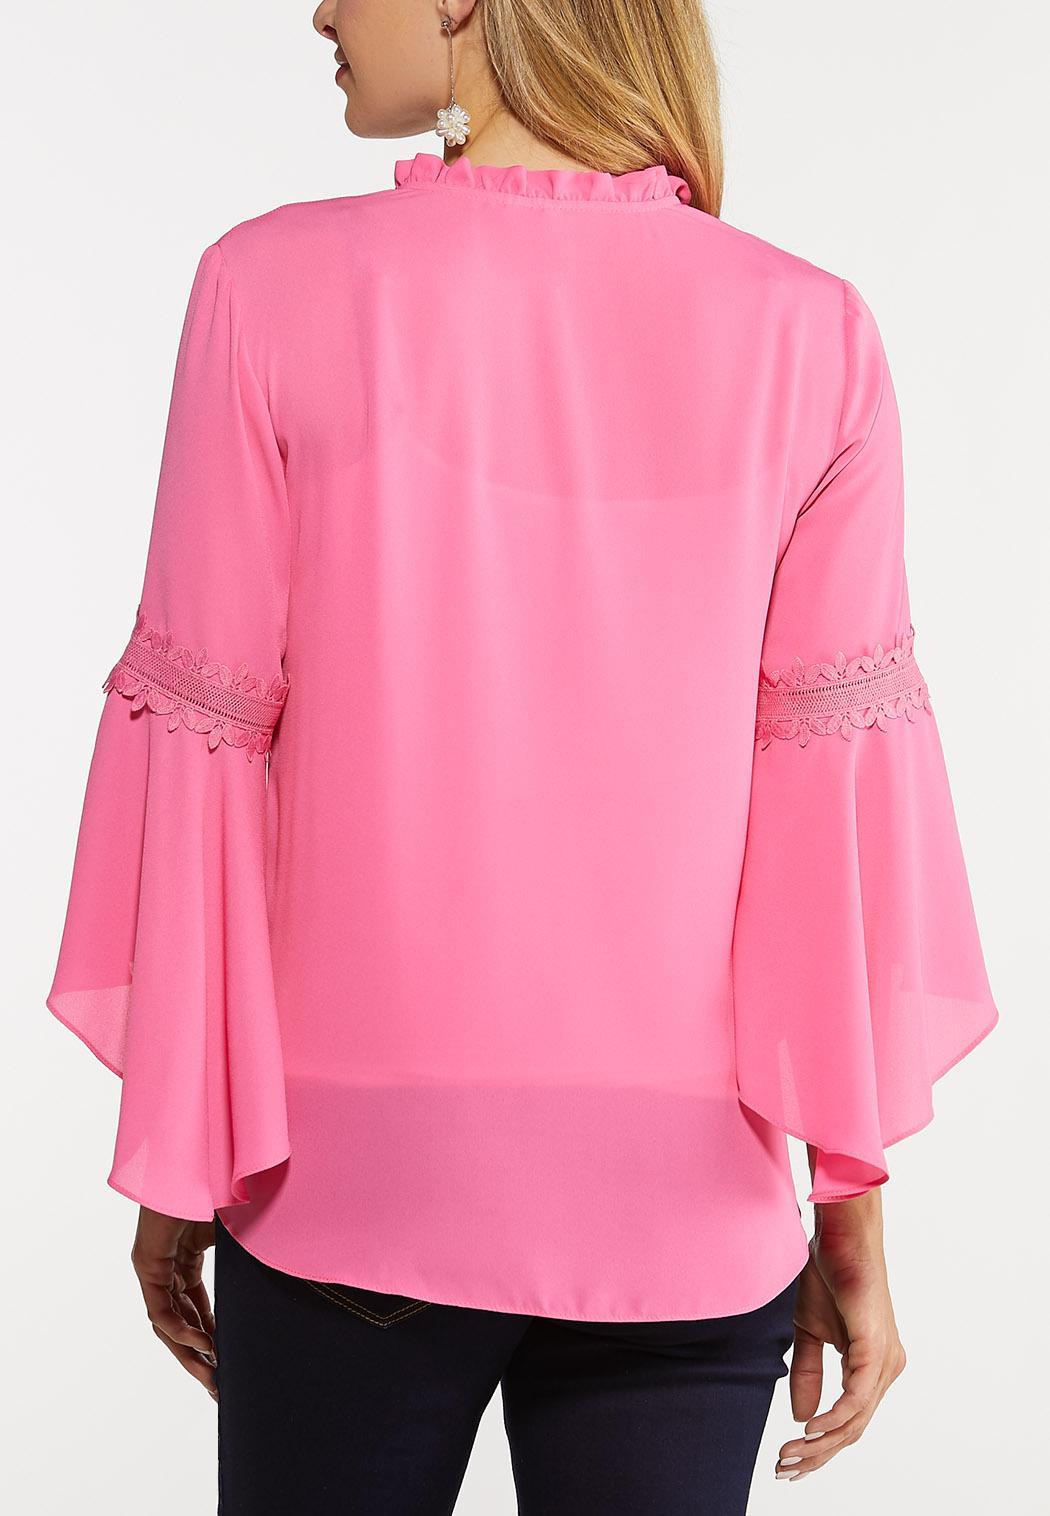 Pink Ruffled Neck Top (Item #44126305)